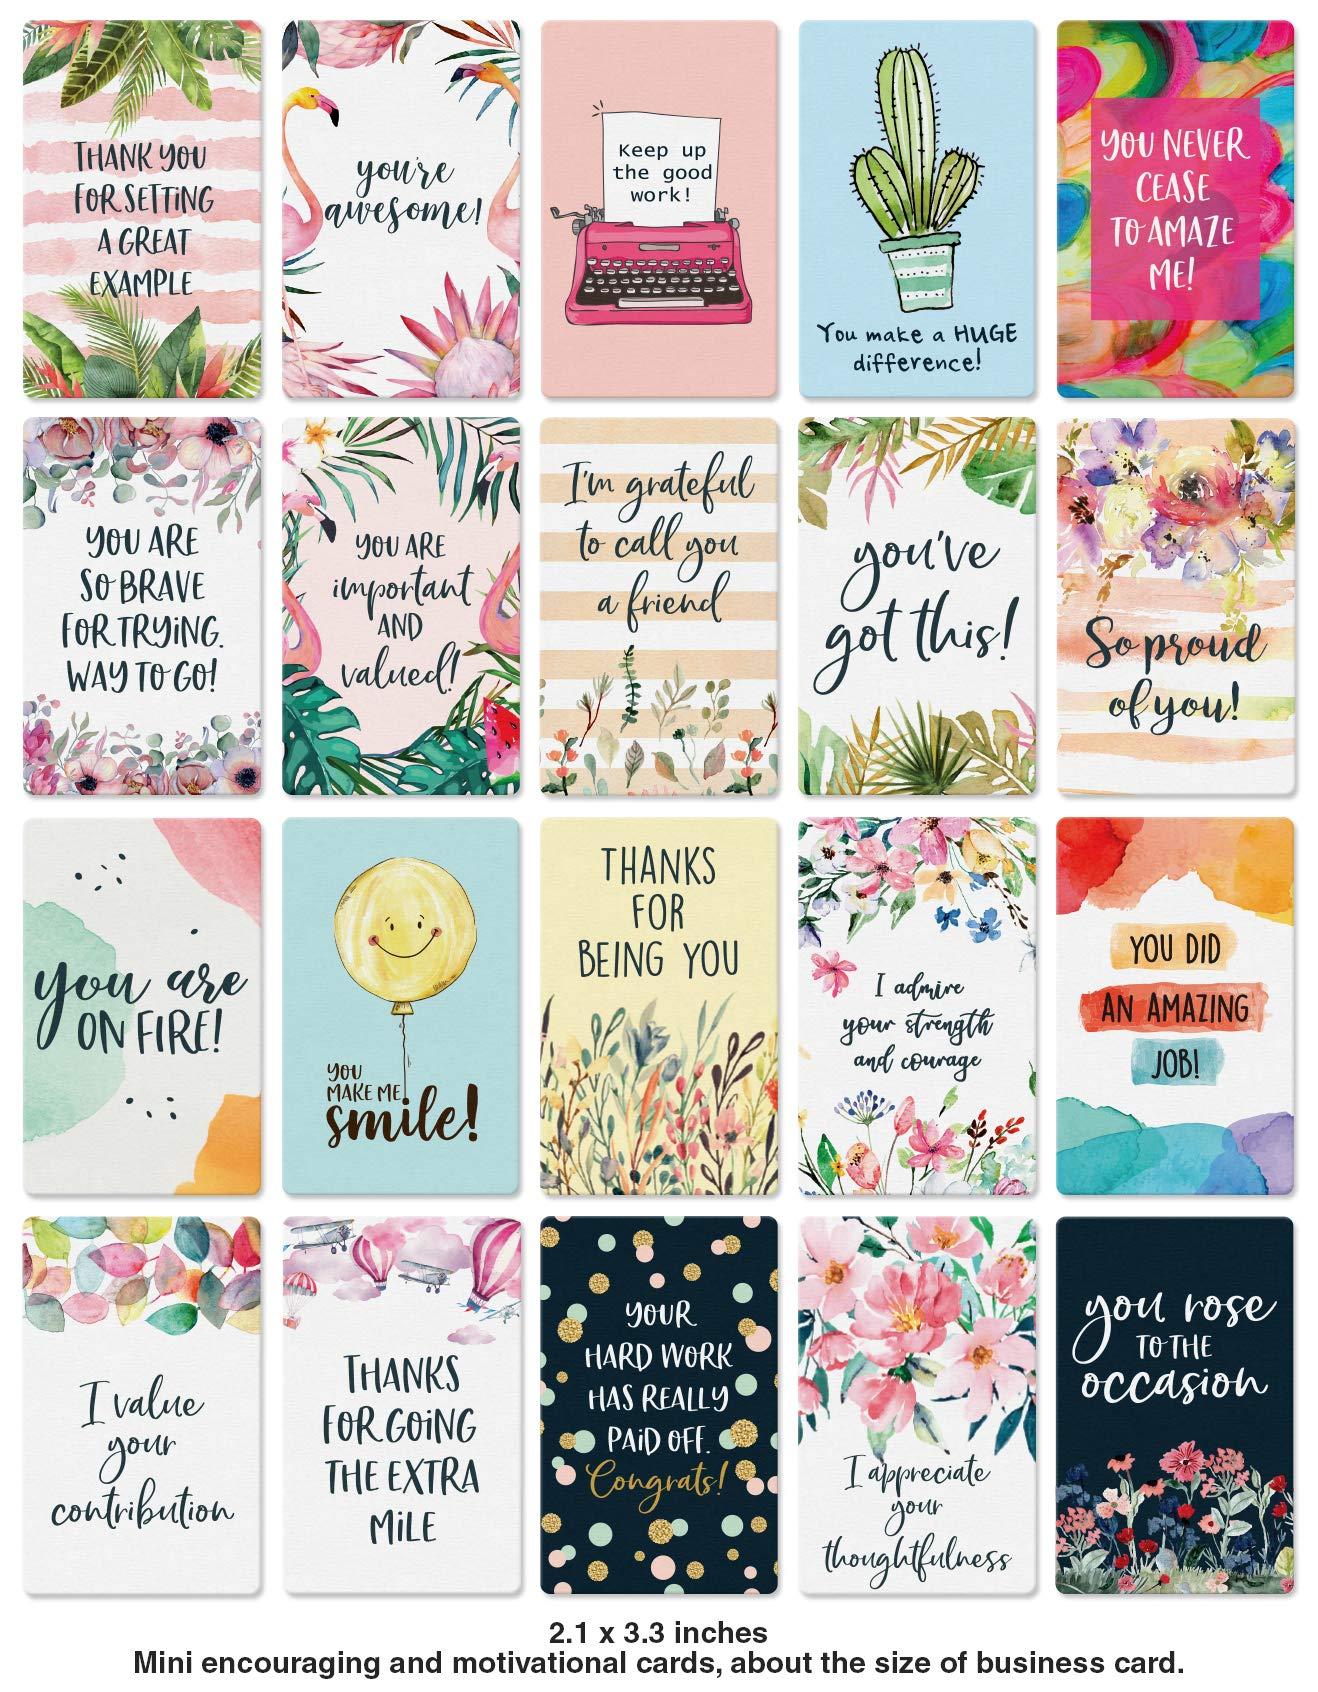 Encouragement Card Courage to Imagine II